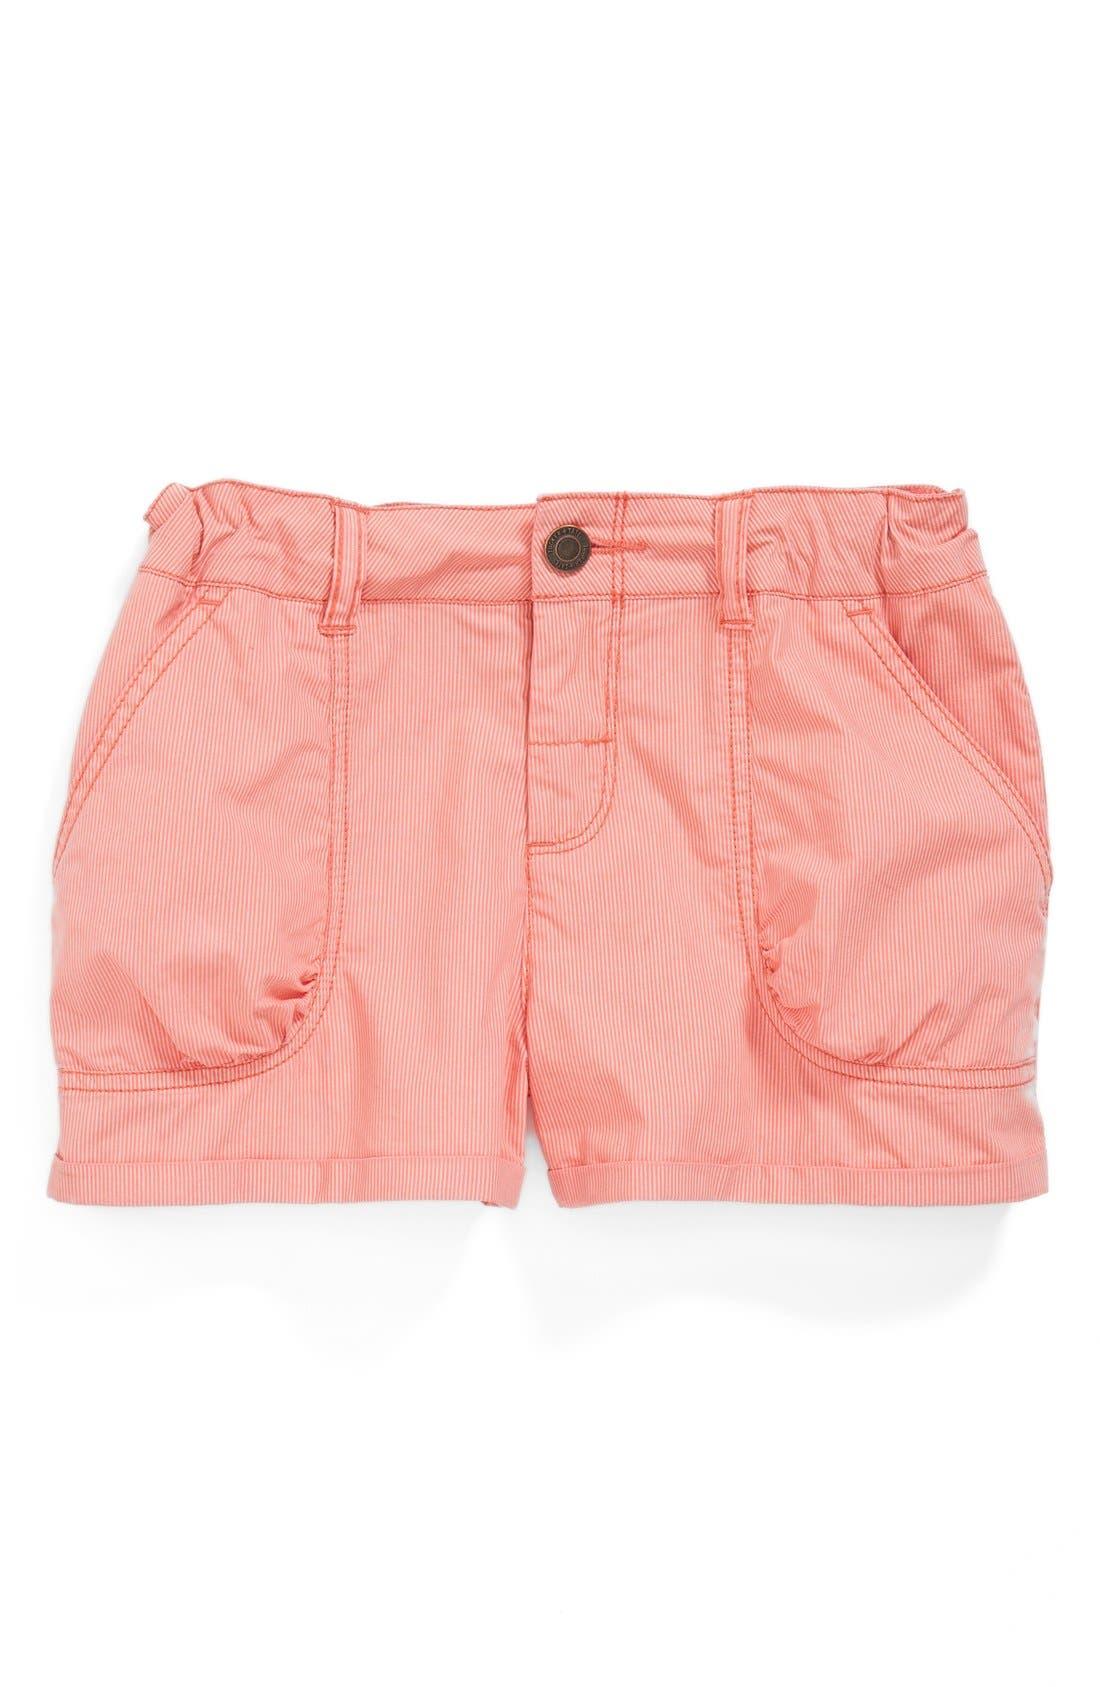 Main Image - Tucker + Tate 'Mindy' Shorts (Big Girls)